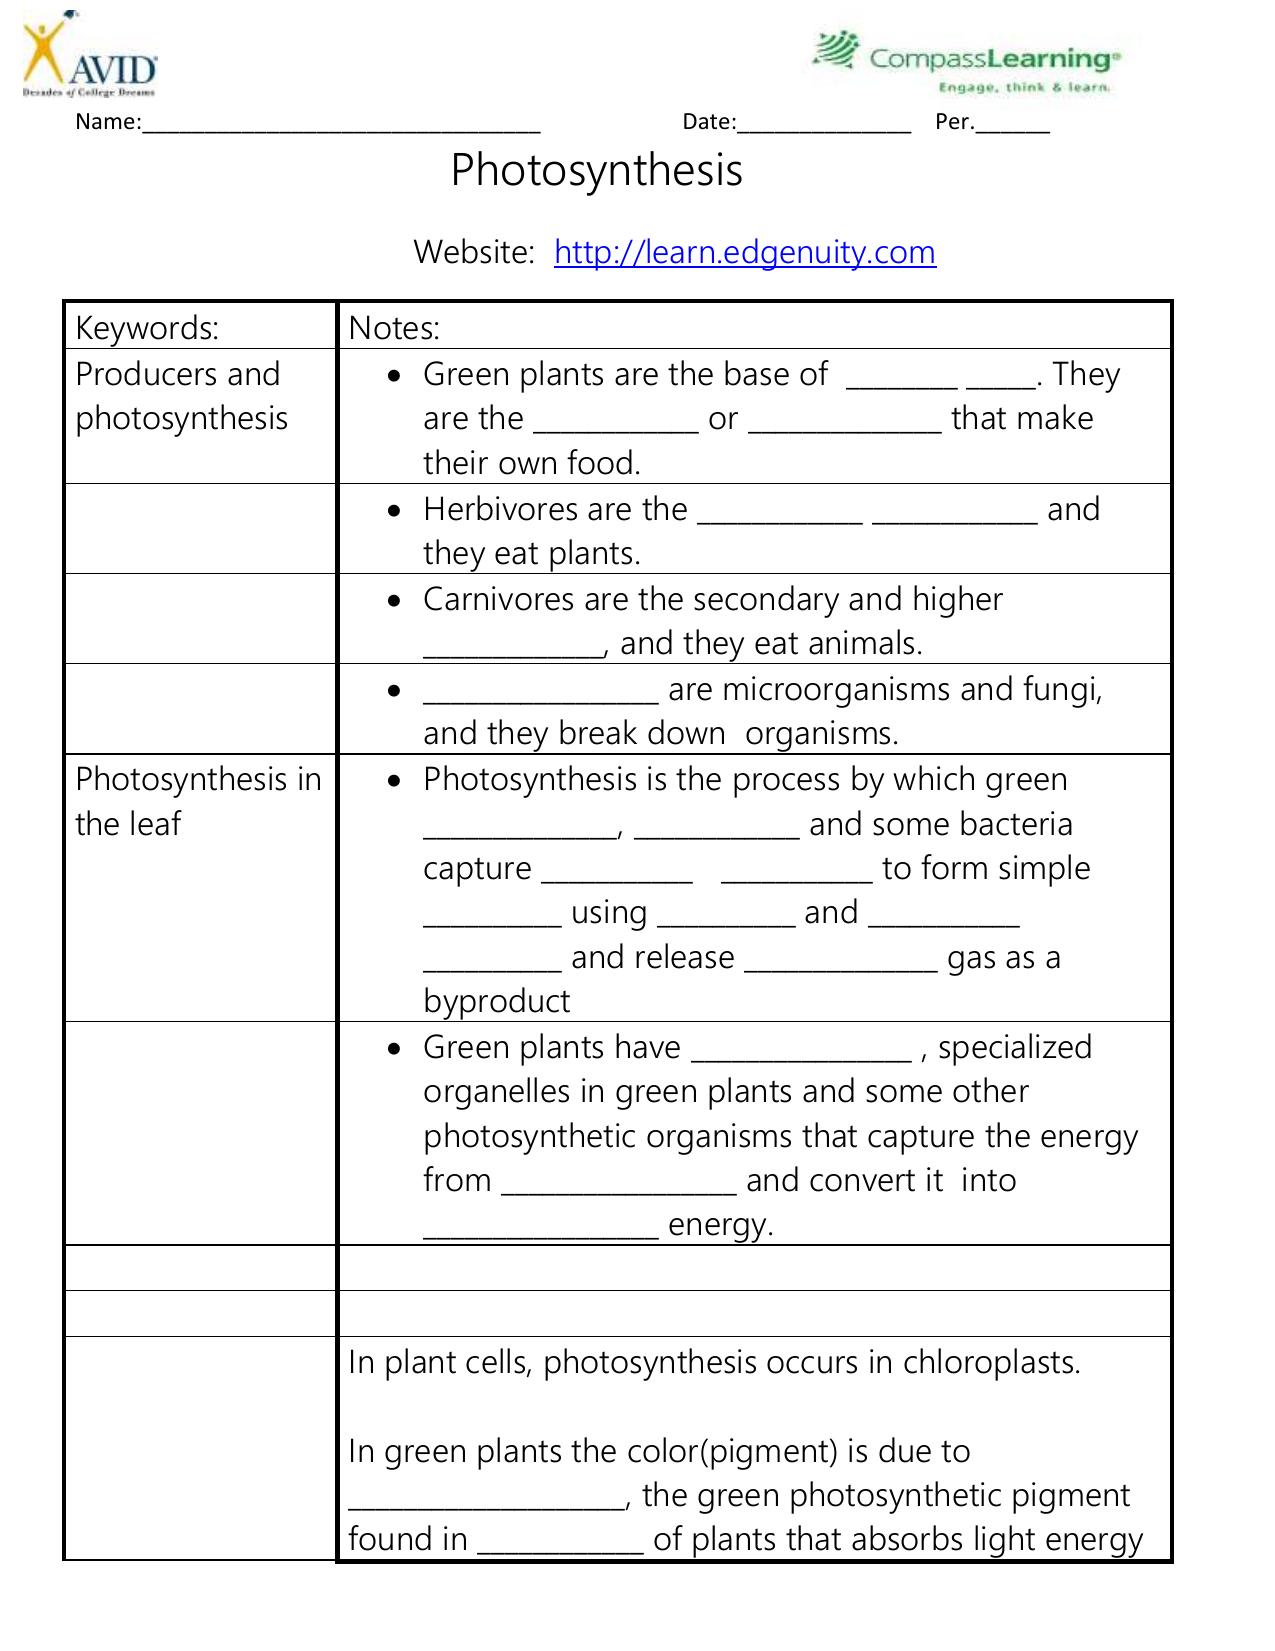 photosynthesis edgenuity notes